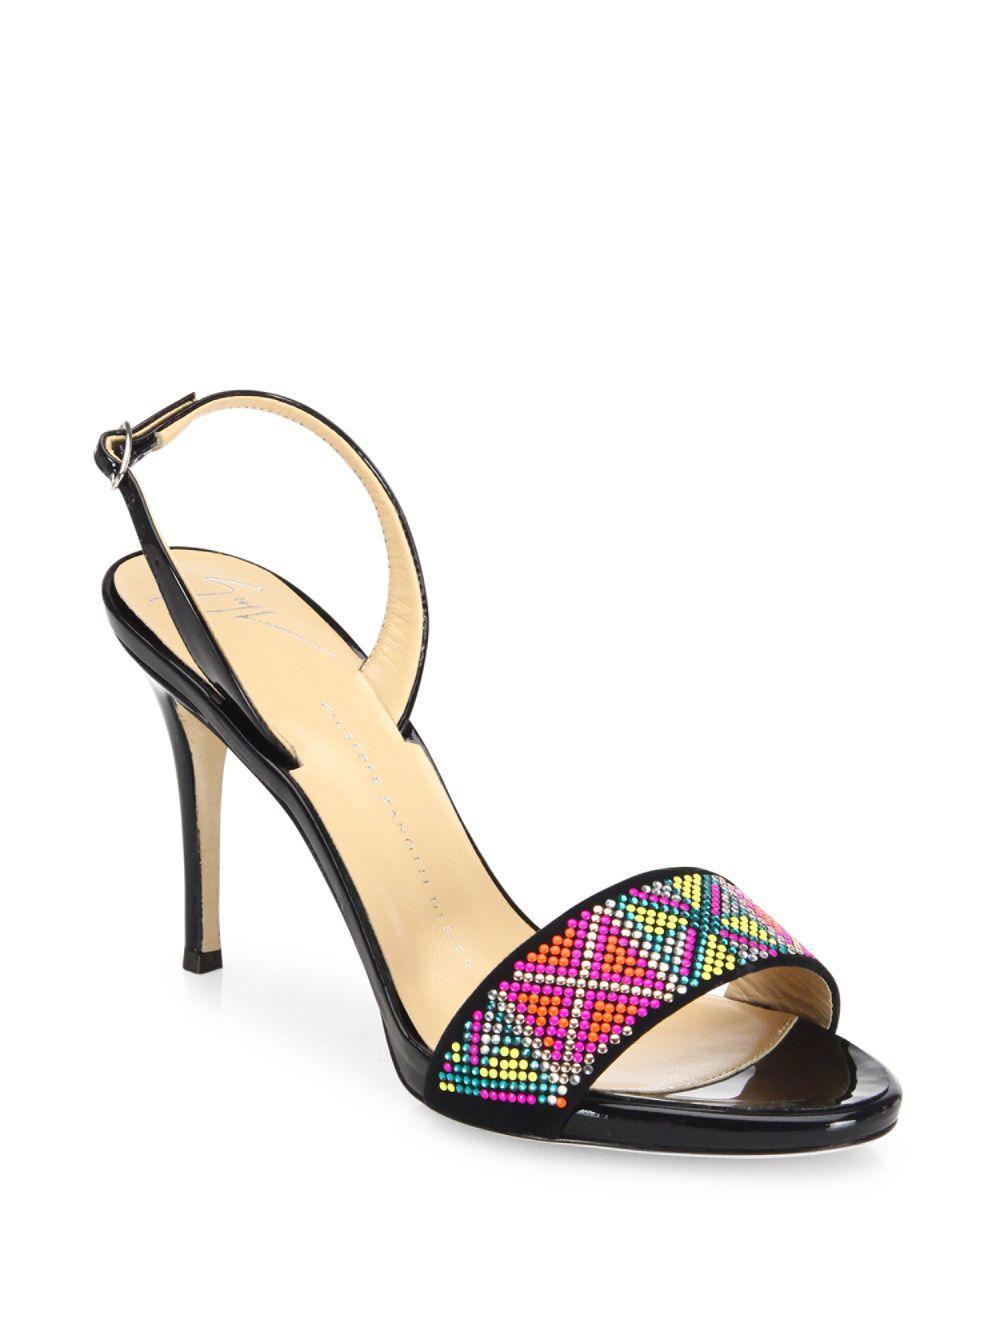 4a5190af2 Giuseppe Zanotti. Women s Black Swarovski Crystal Accented Patent Leather  Slingback Sandals